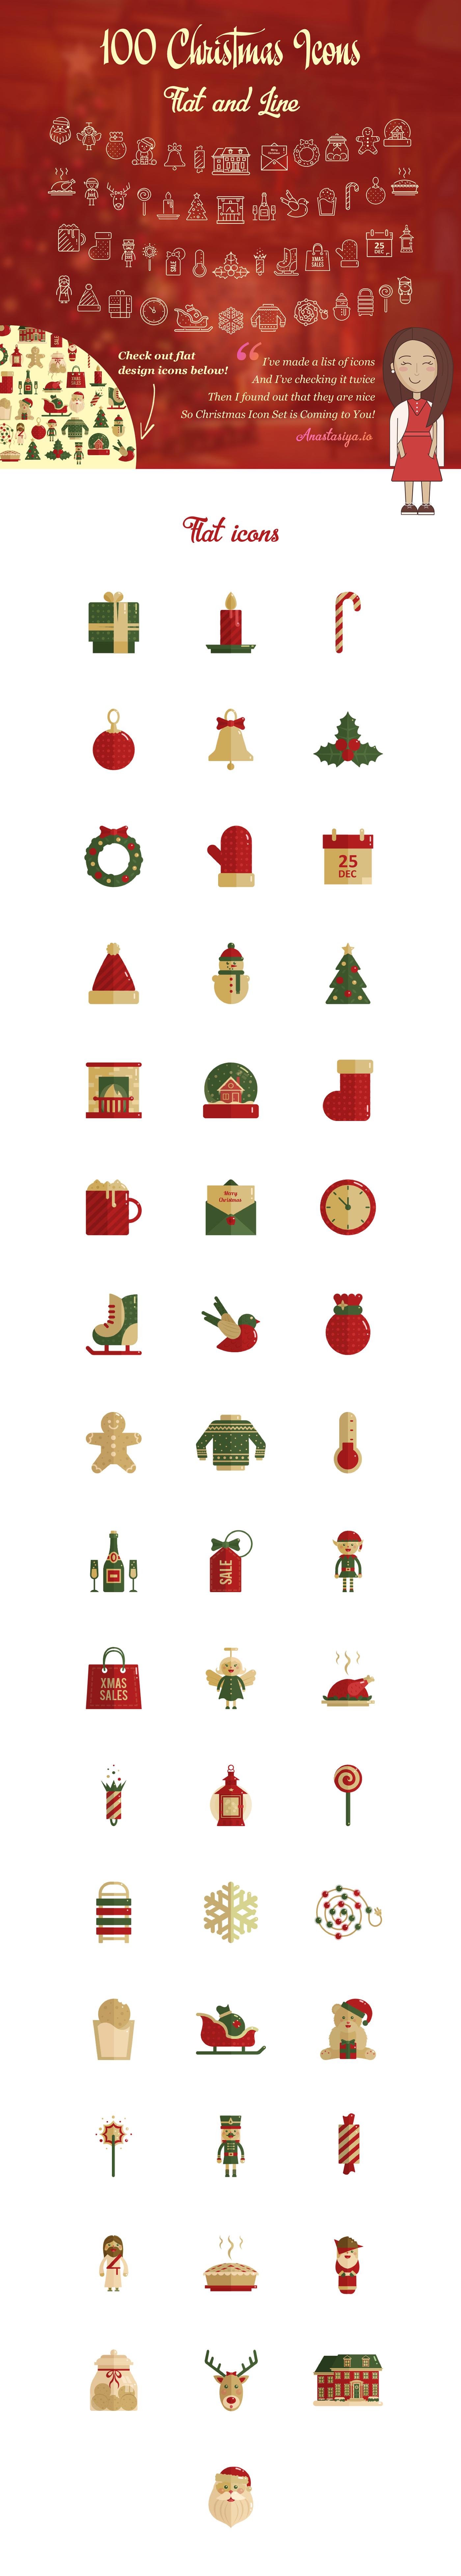 free freebie Christmas icons icon set flat line download free gift ai svg EPS psd